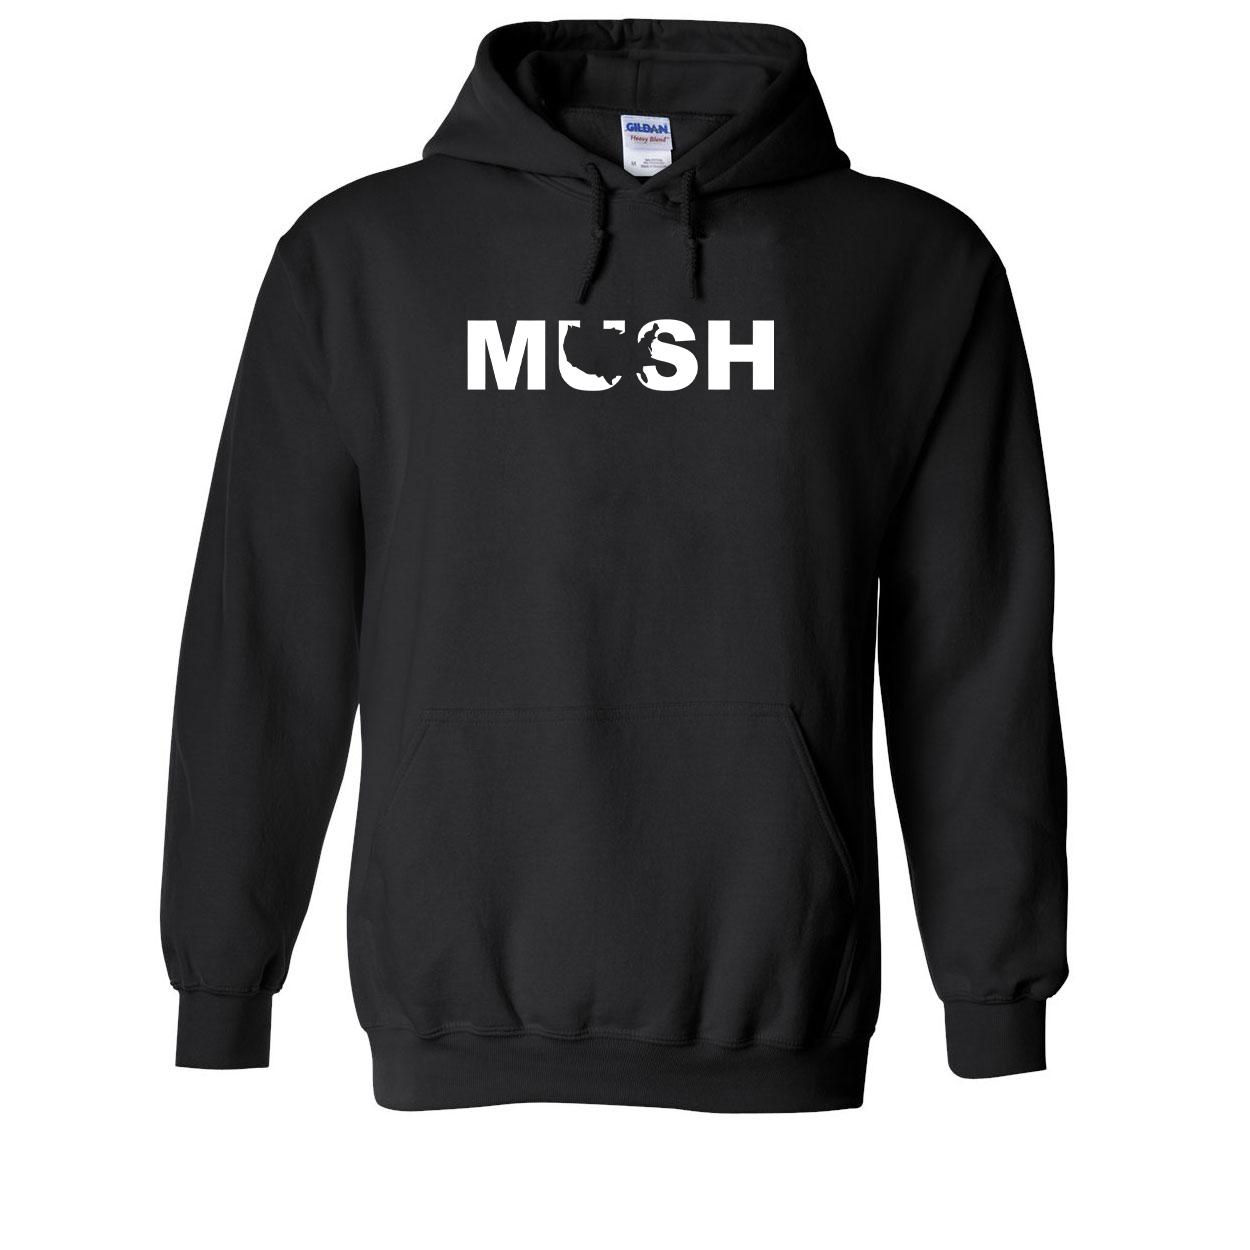 Mush United States Classic Sweatshirt Black (White Logo)